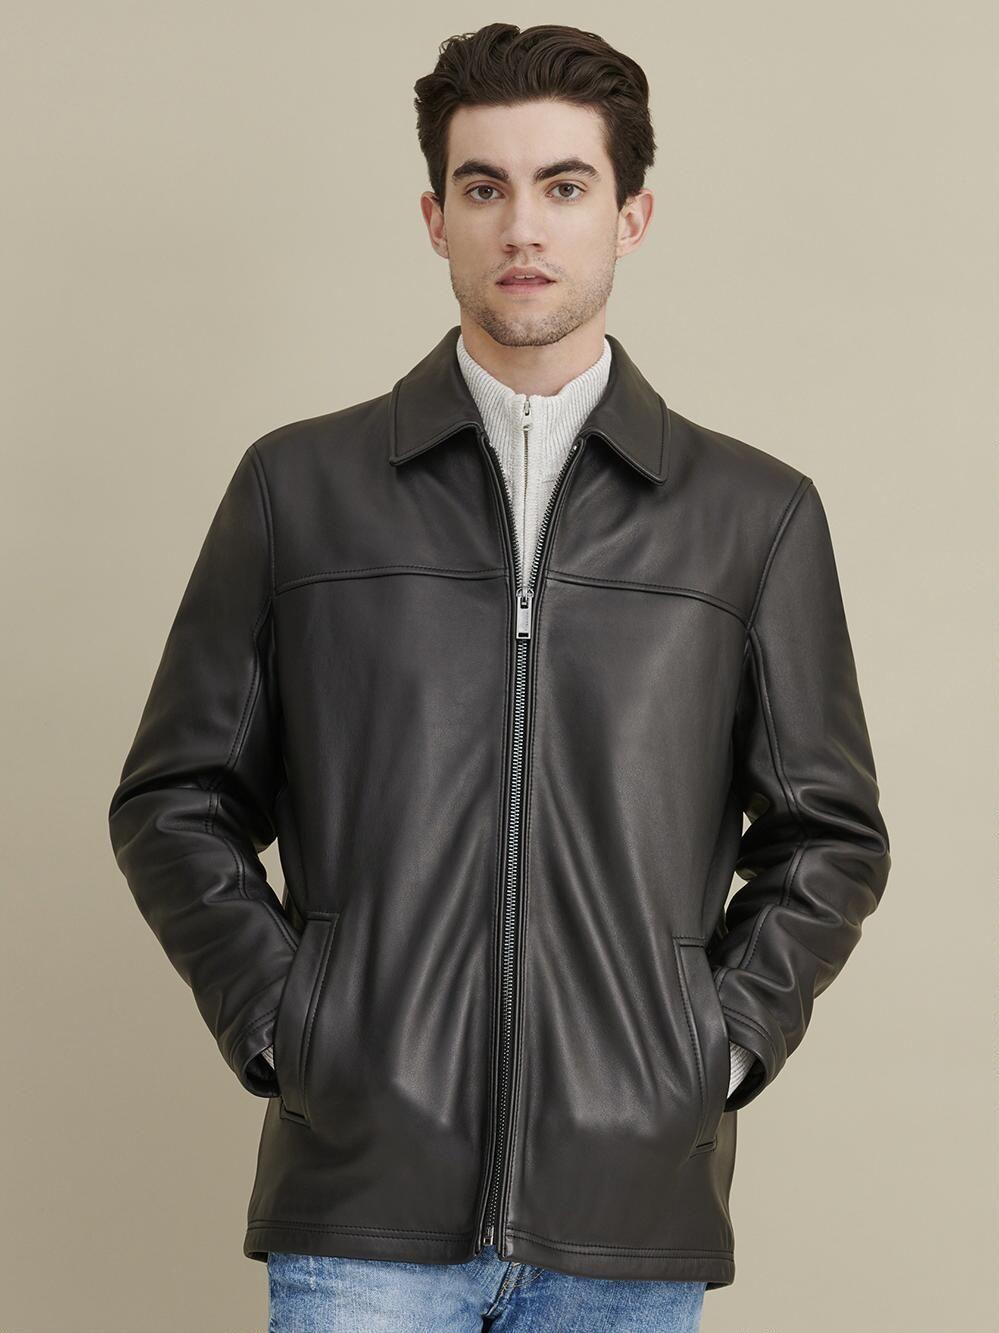 Wilsons Leather Men S Women S Leather Jackets Handbags More In 2021 Leather Jacket Black Leather Biker Jacket Jackets [ 1333 x 999 Pixel ]